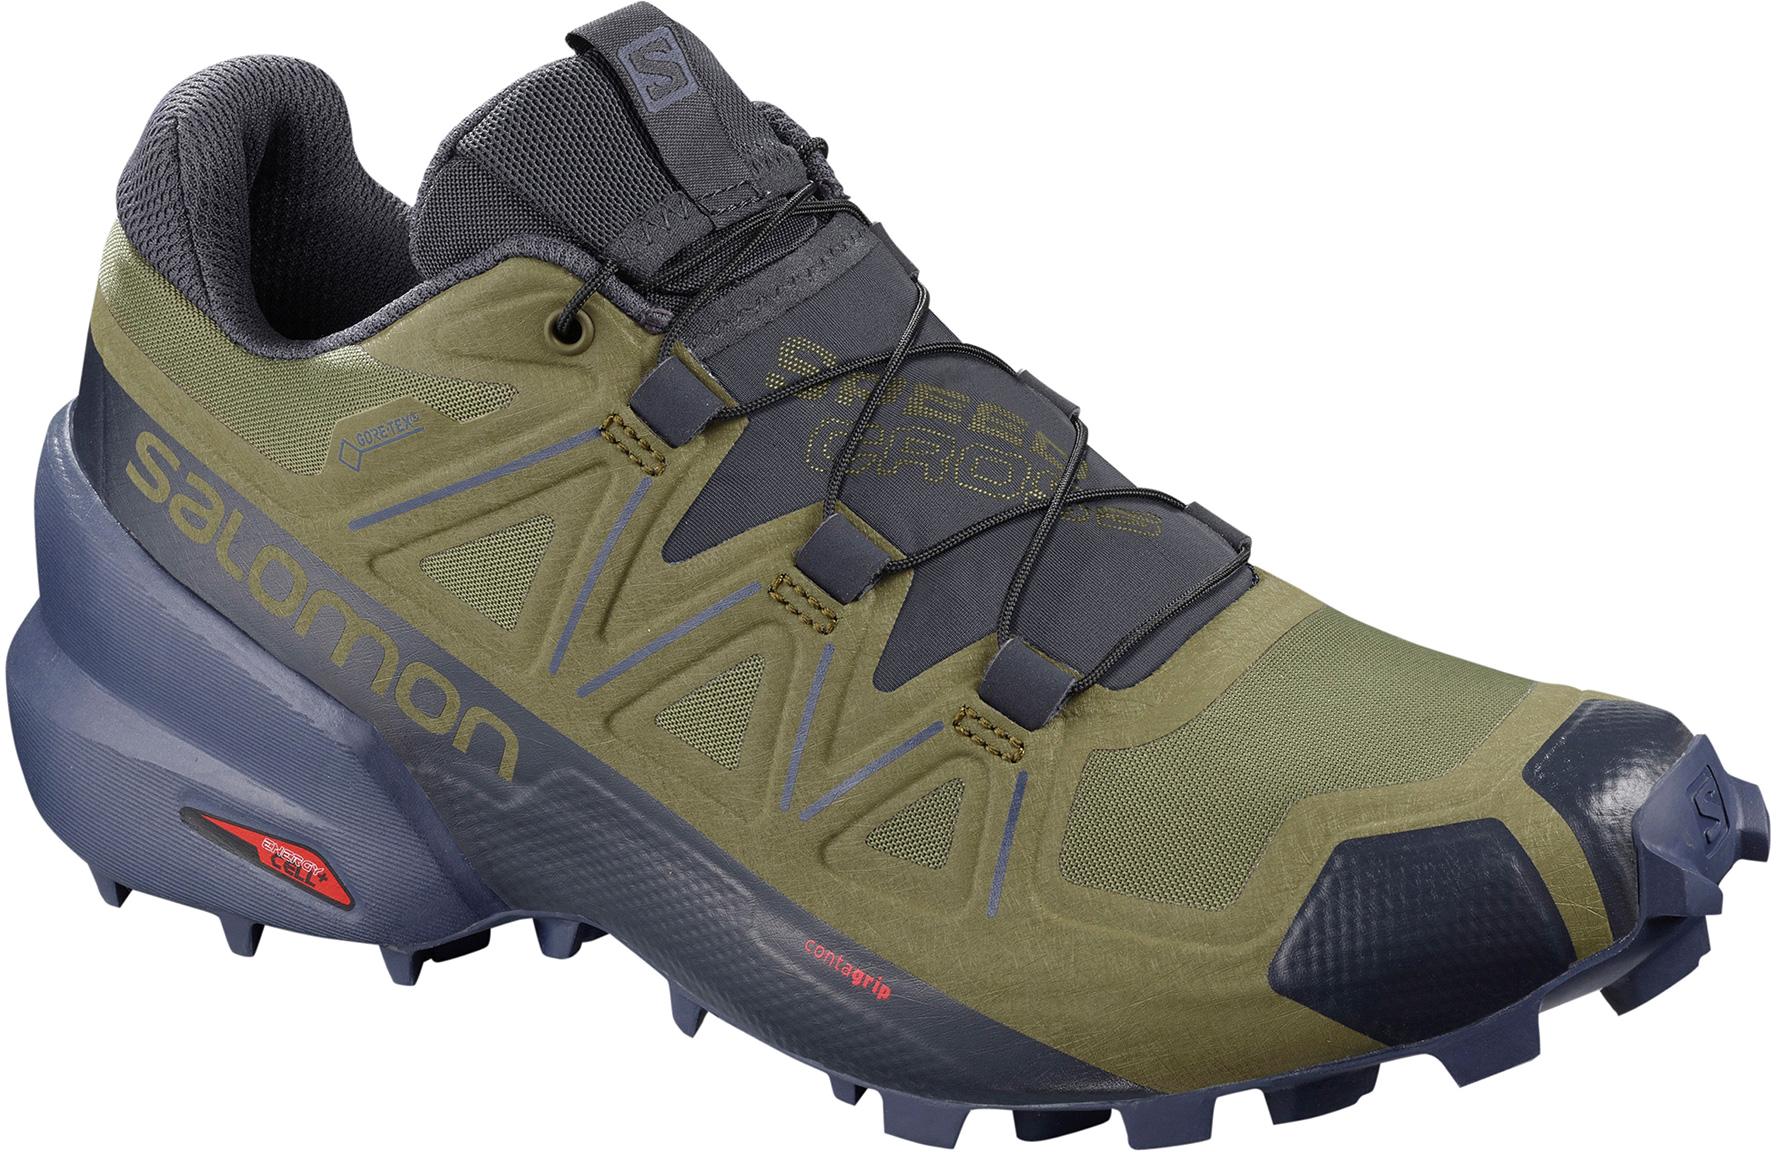 Salomon Speedcross 5 GTX Trail Running Shoe Women's